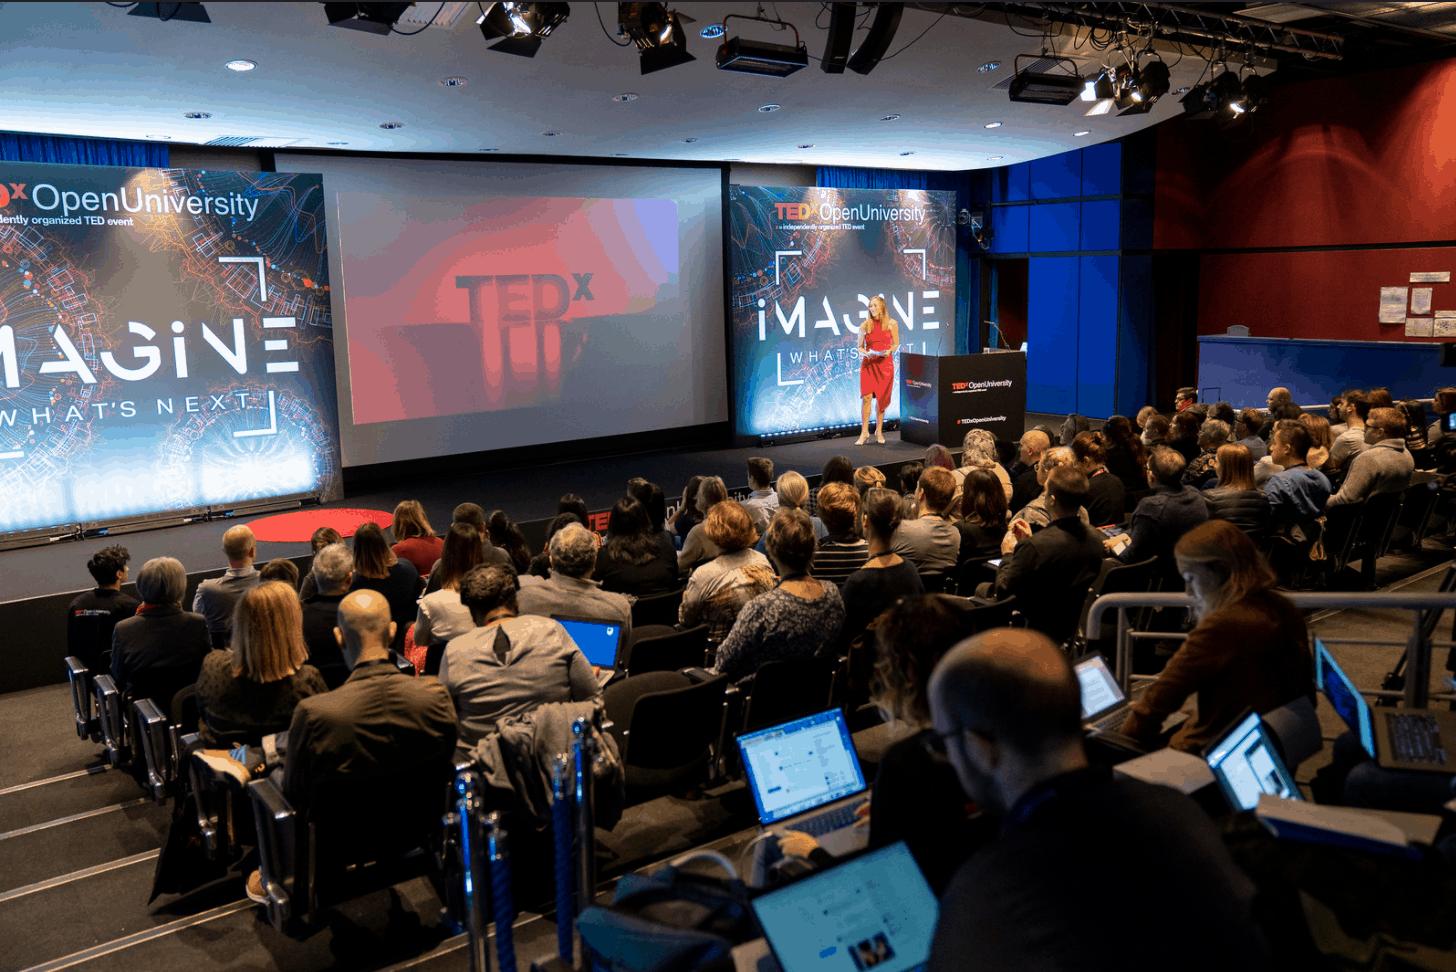 TEDx Open University stage